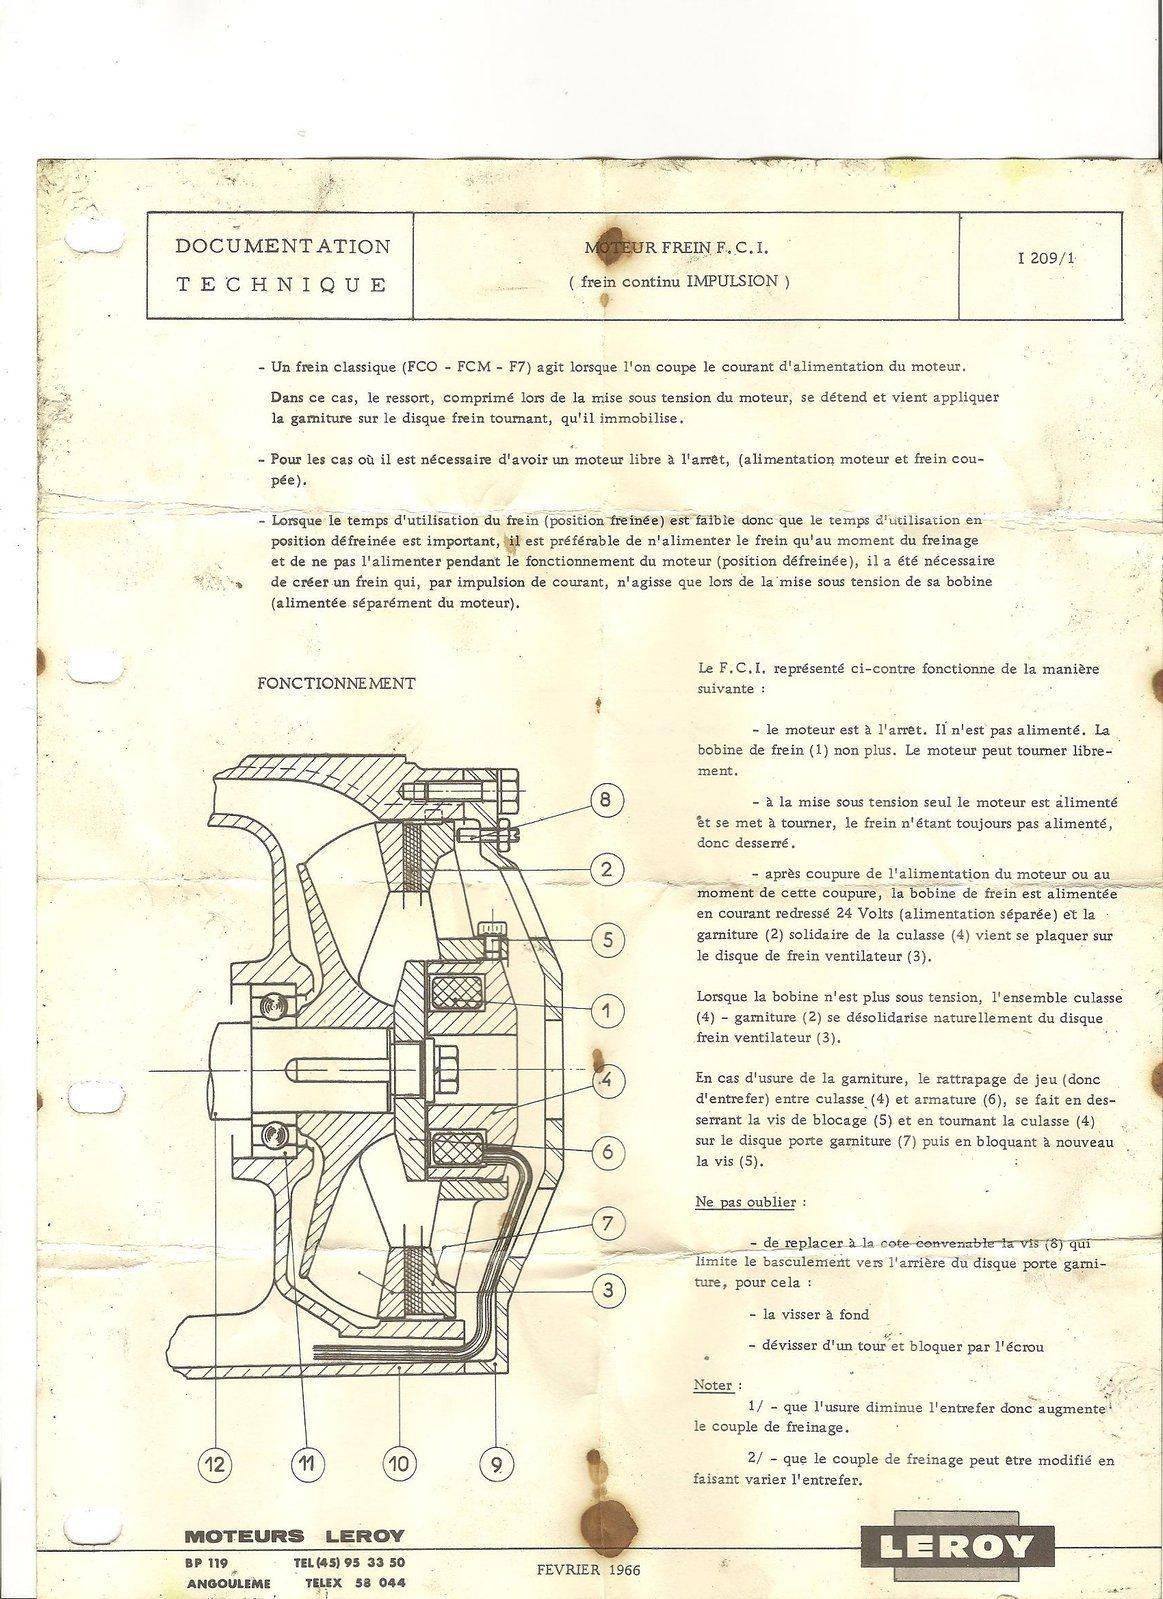 document moteur leroy 1 001.jpg